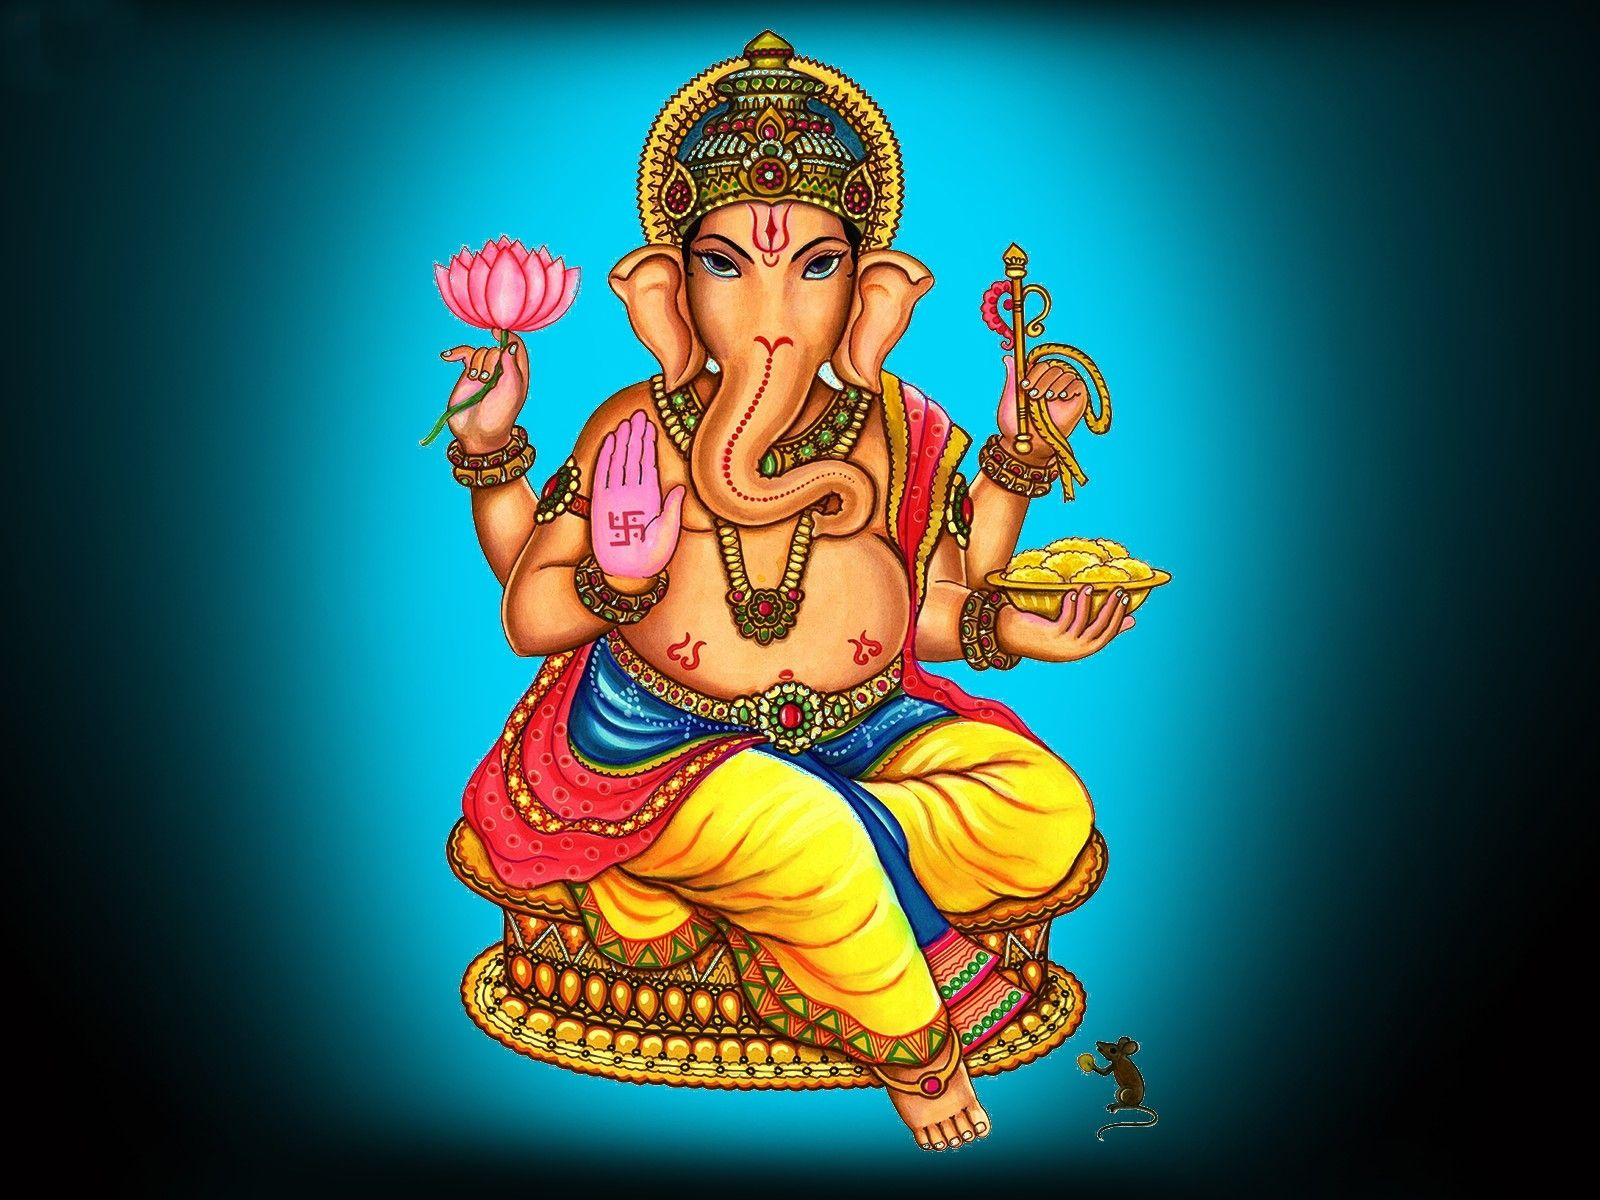 Hd wallpaper ganesh - Ganesha Full Hd Wide Photo Wallpaper Pics 2015 1080p